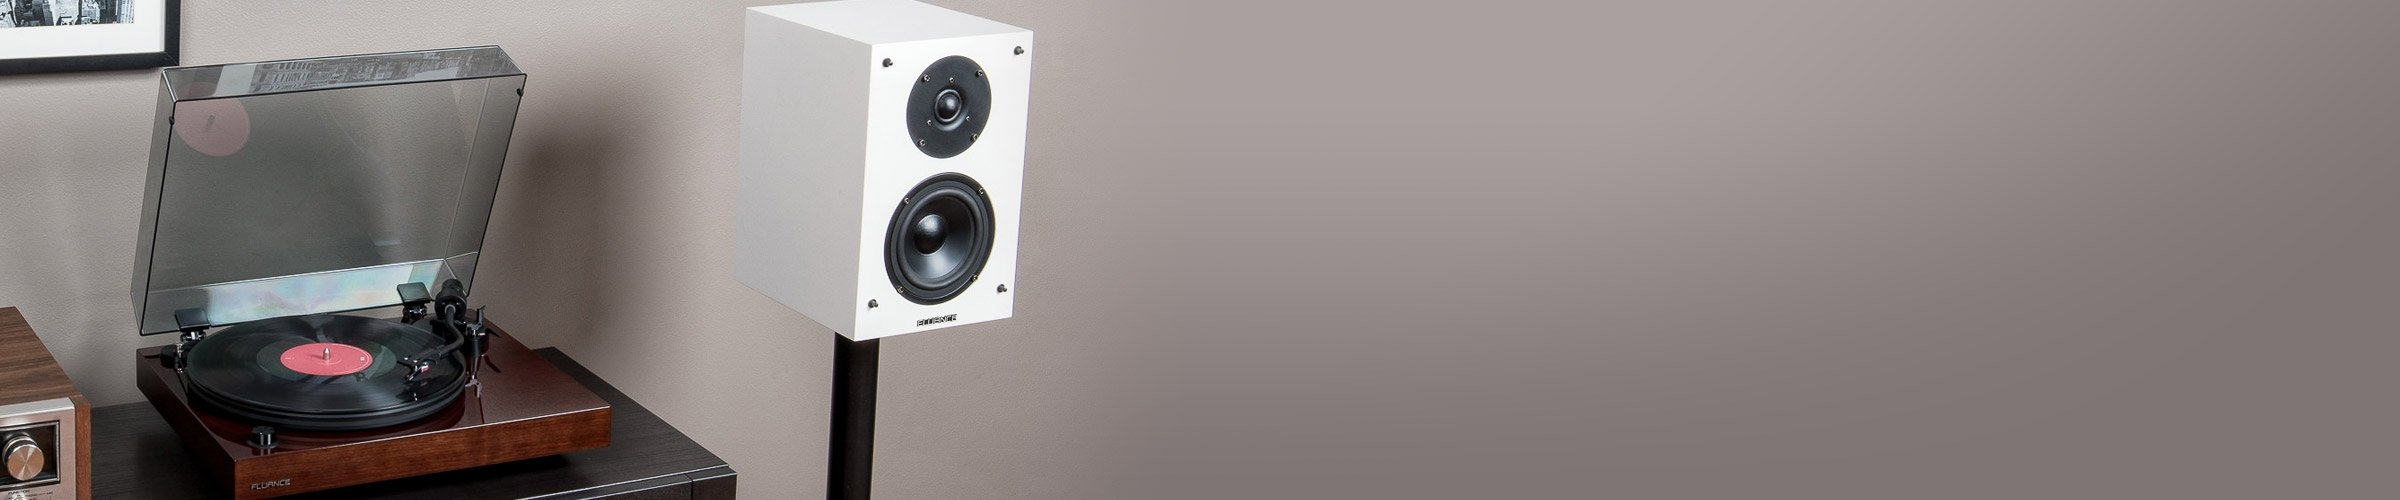 SX6-BK Bookshelf Surround Sound Speakers for Home Theater